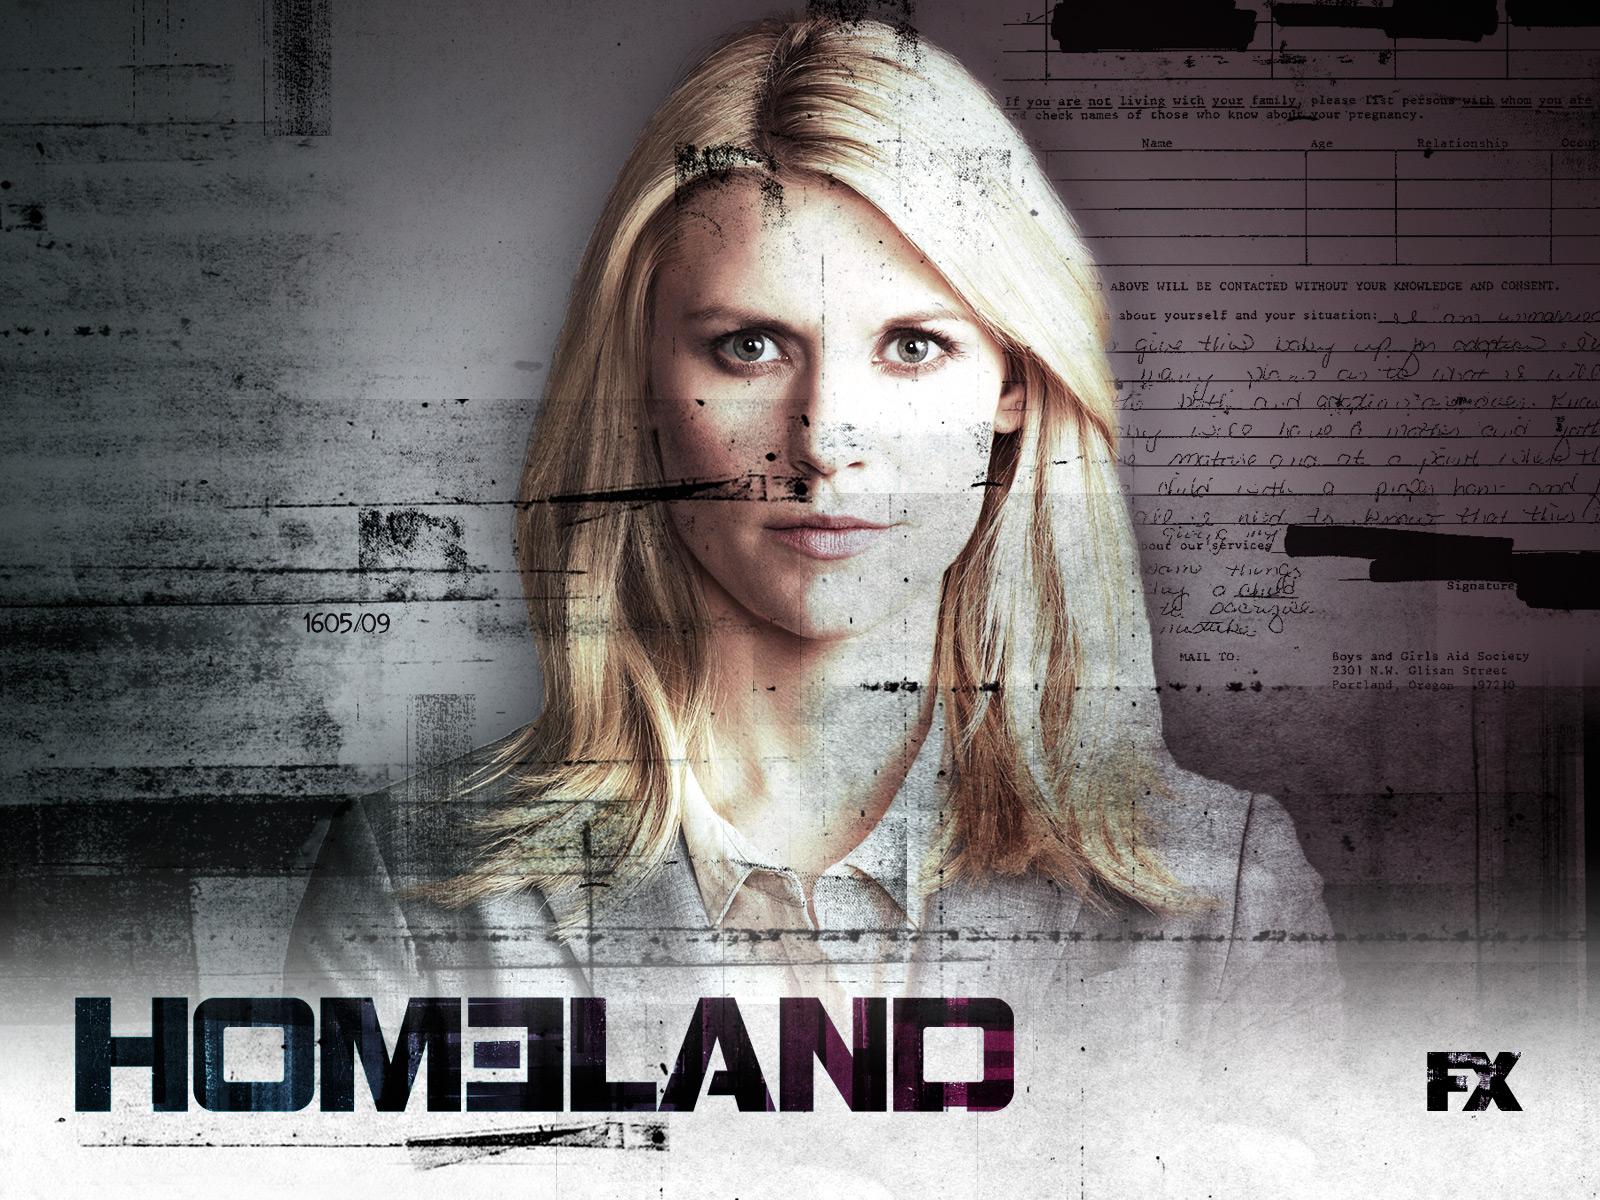 Homeland-homeland-30373150-1600-1200